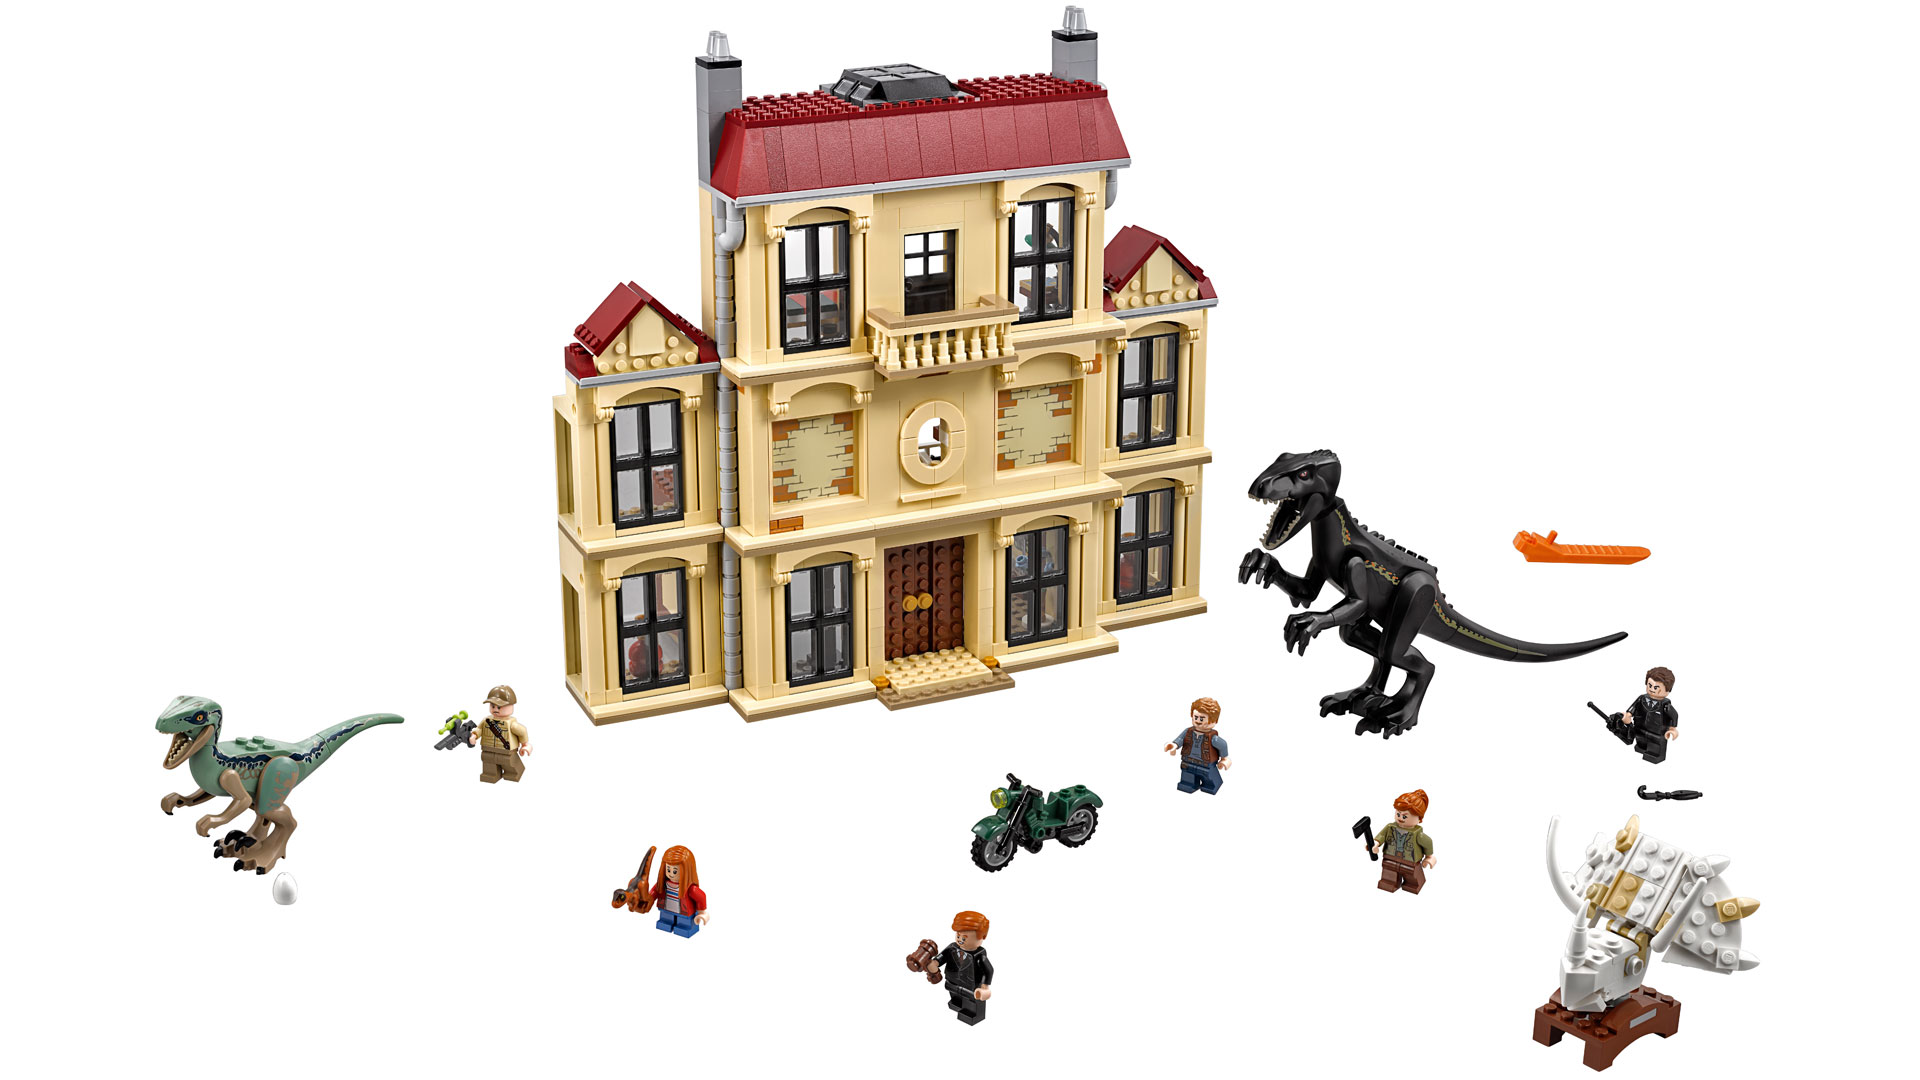 LEGO Jurassic World Set 75930 Indoraptor Rampage at Lockwood Estate at Toy Fair 2018